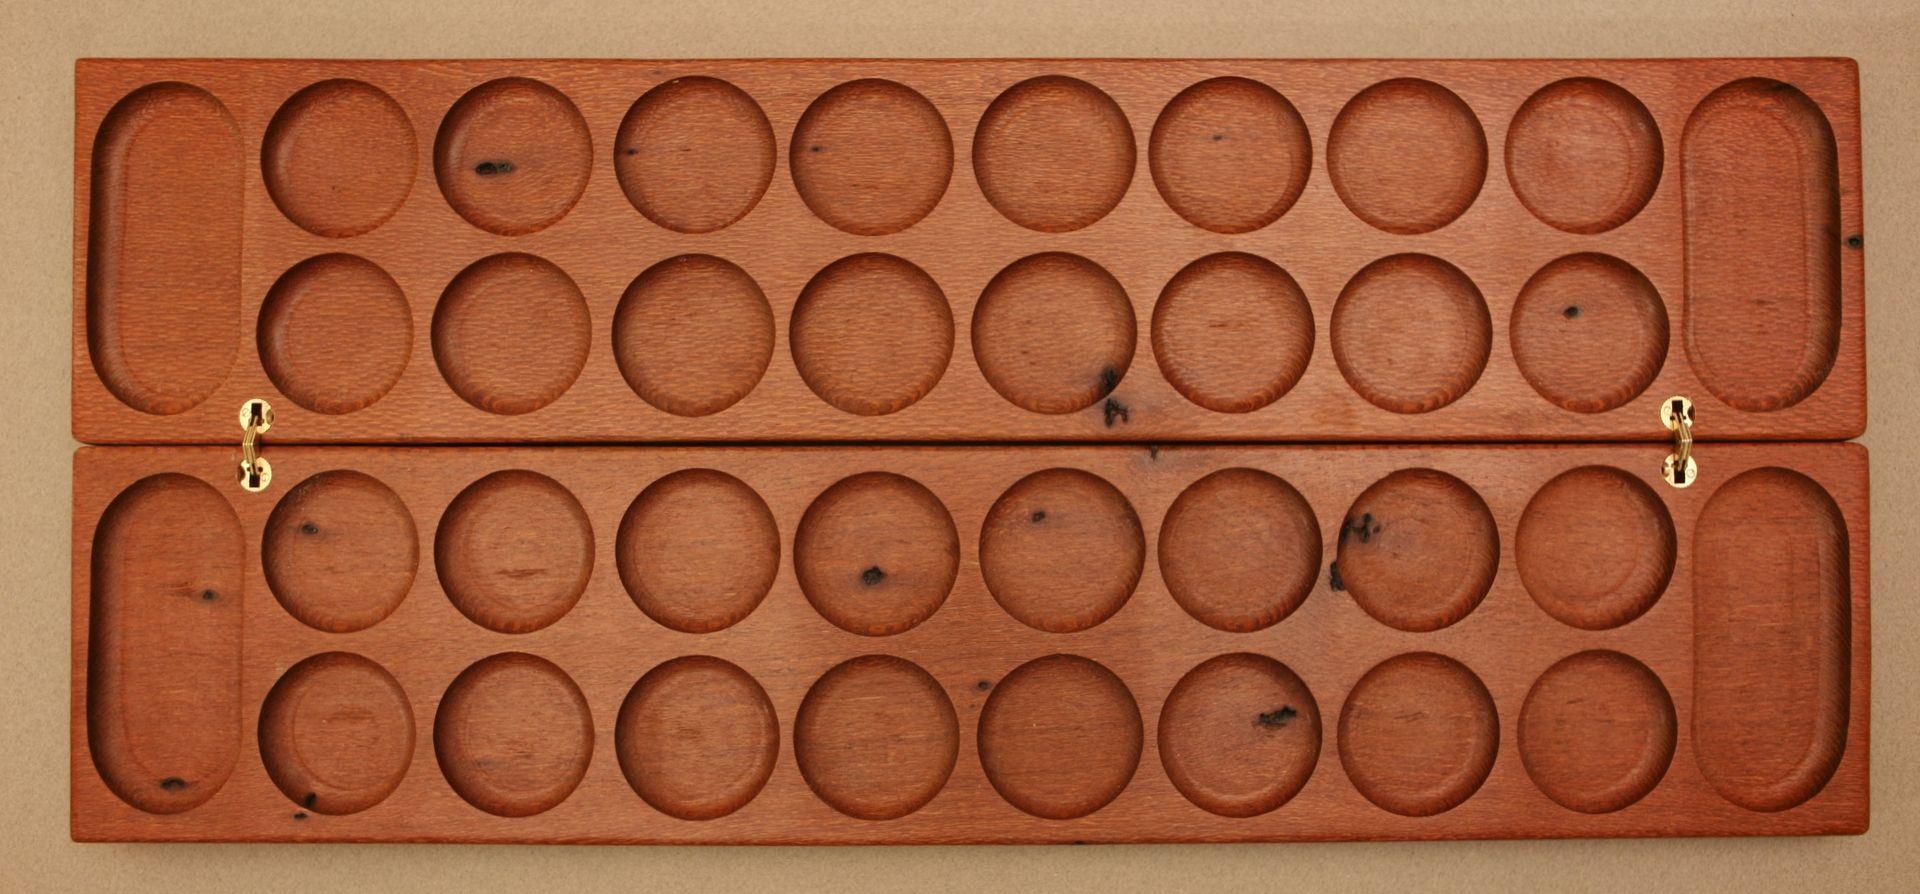 how to make a mancala game board